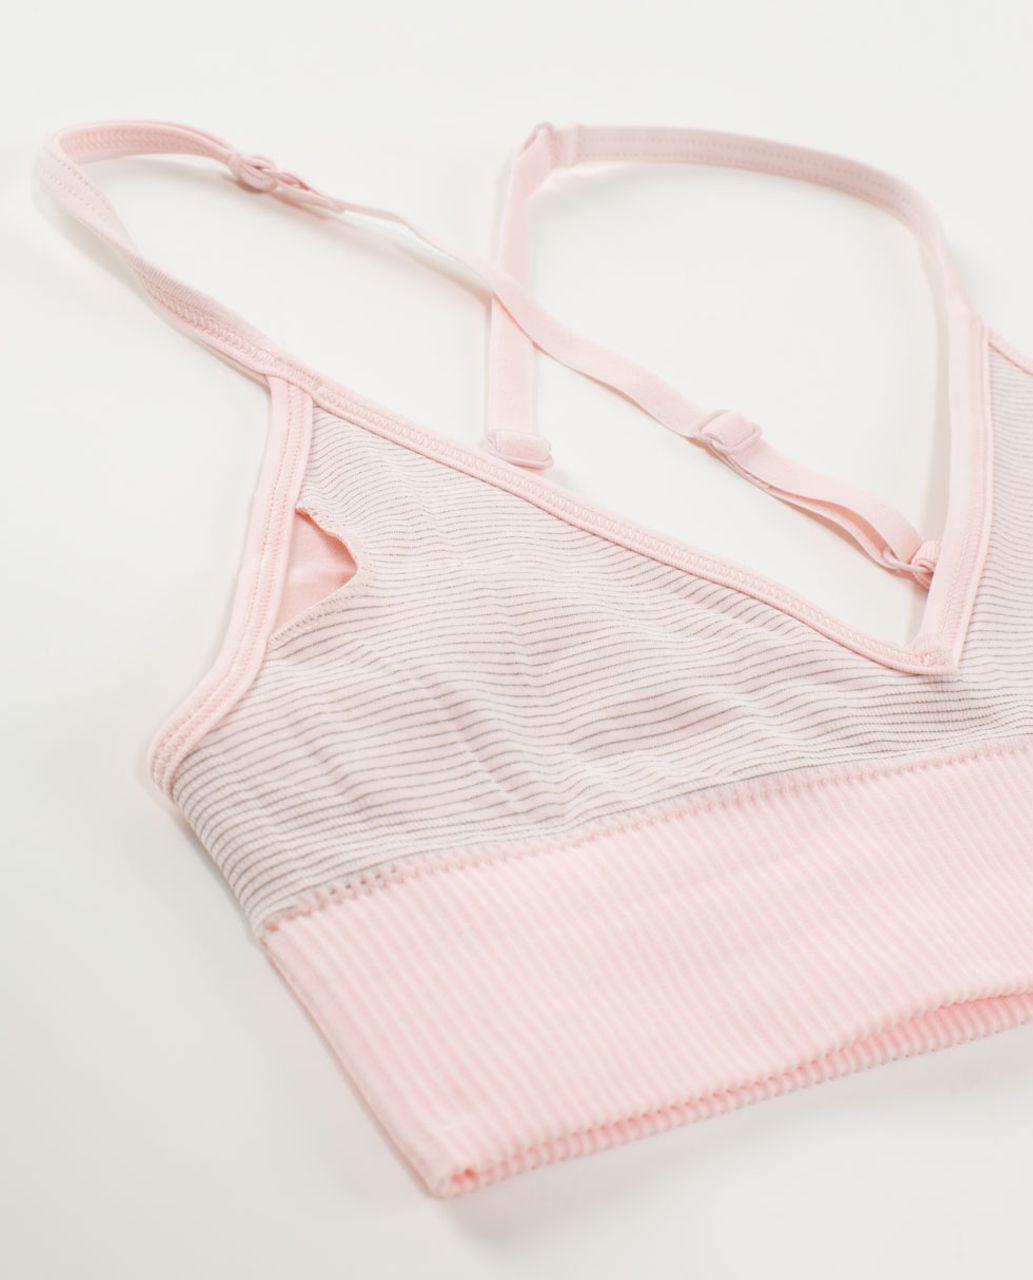 Lululemon Ebb To Street Bra - Heathered Pretty Pink